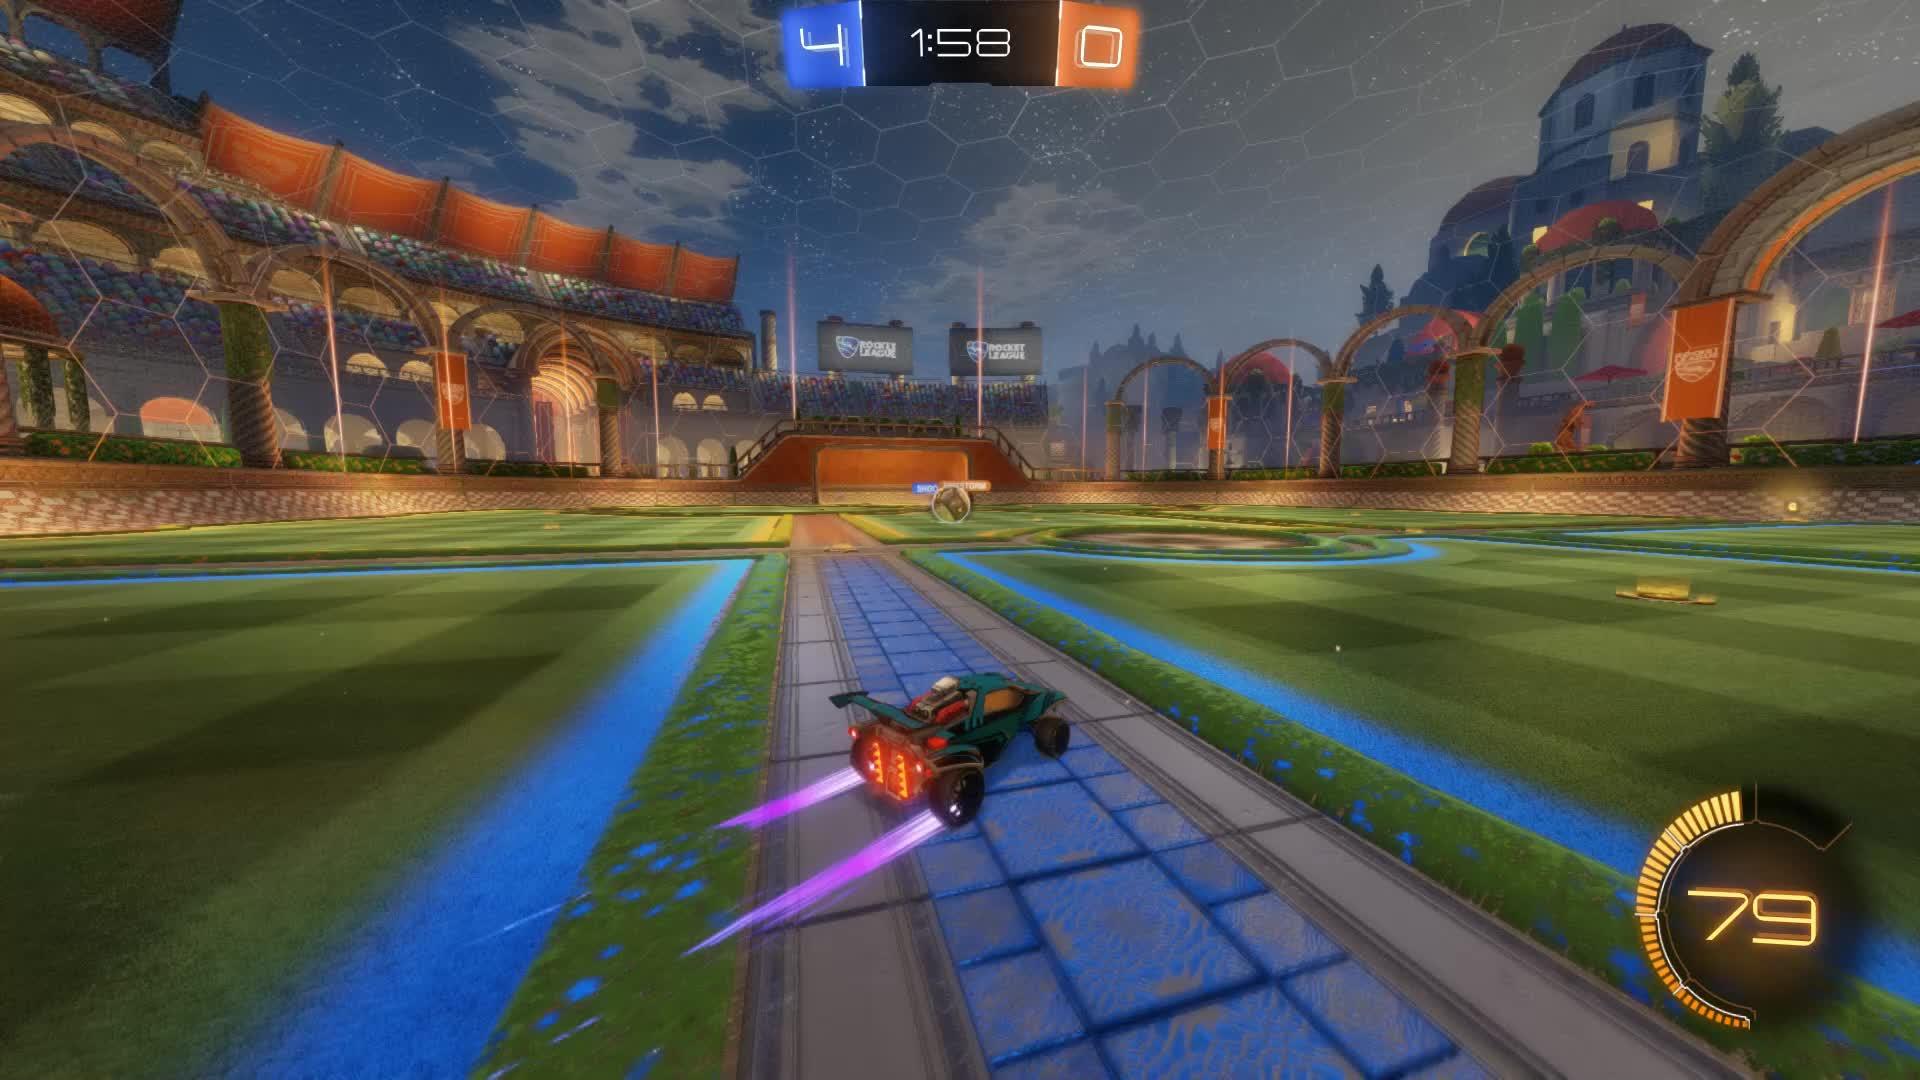 Gif Your Game, GifYourGame, Goal, Rocket League, RocketLeague, Squash, Goal 5: Squash GIFs